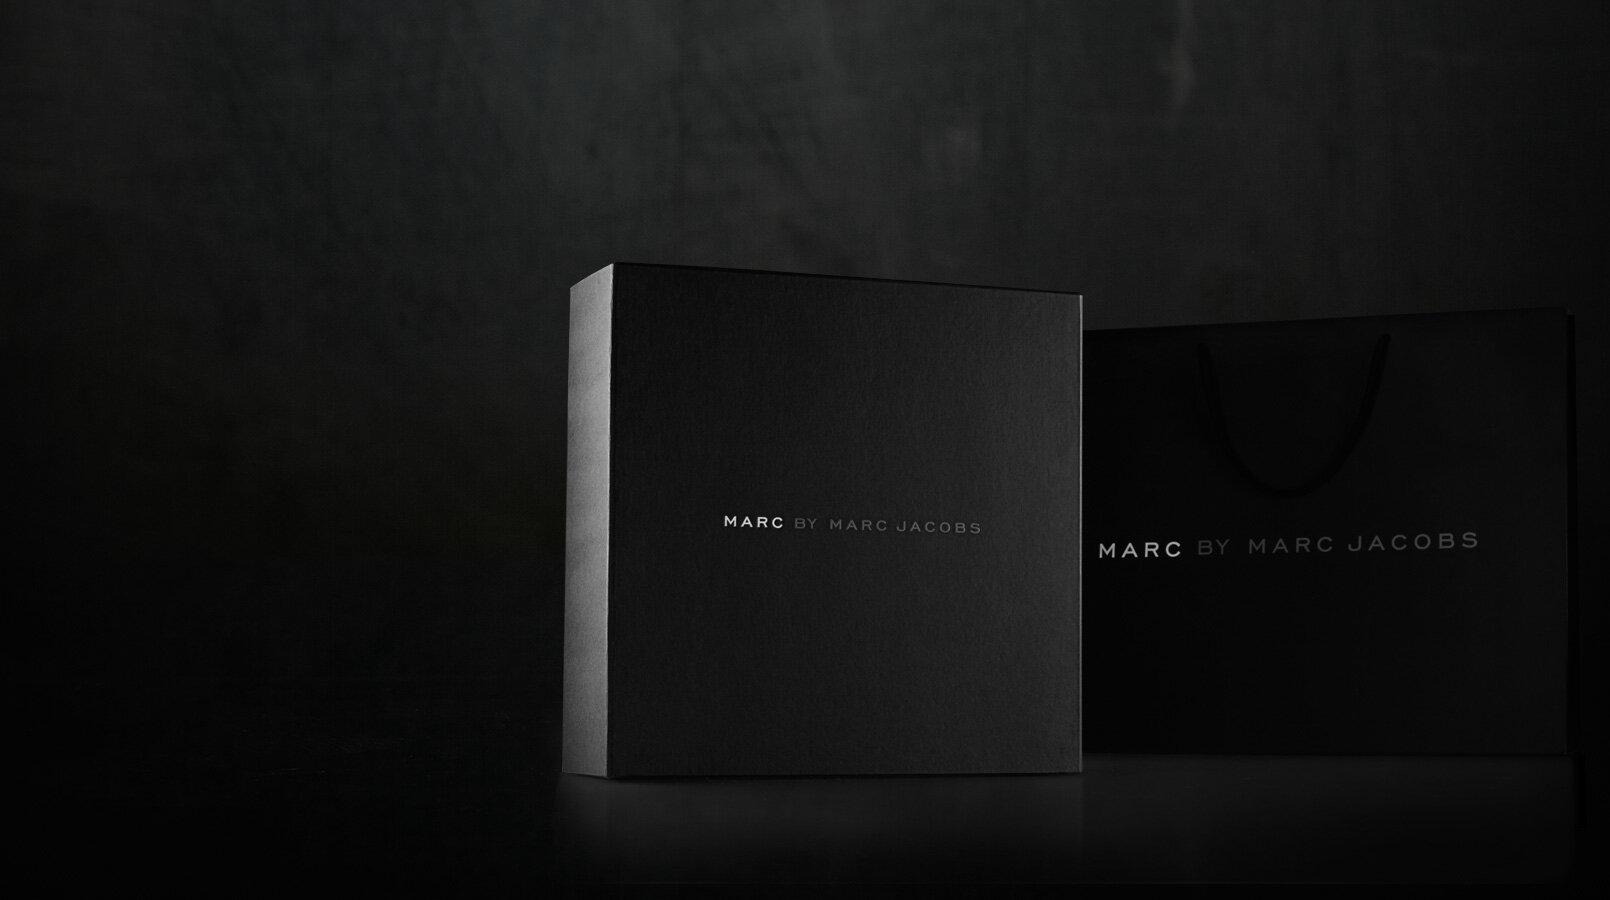 MARC-JACOBS-刚性箱式设计 - 包装 - 公司-1.1.jpg